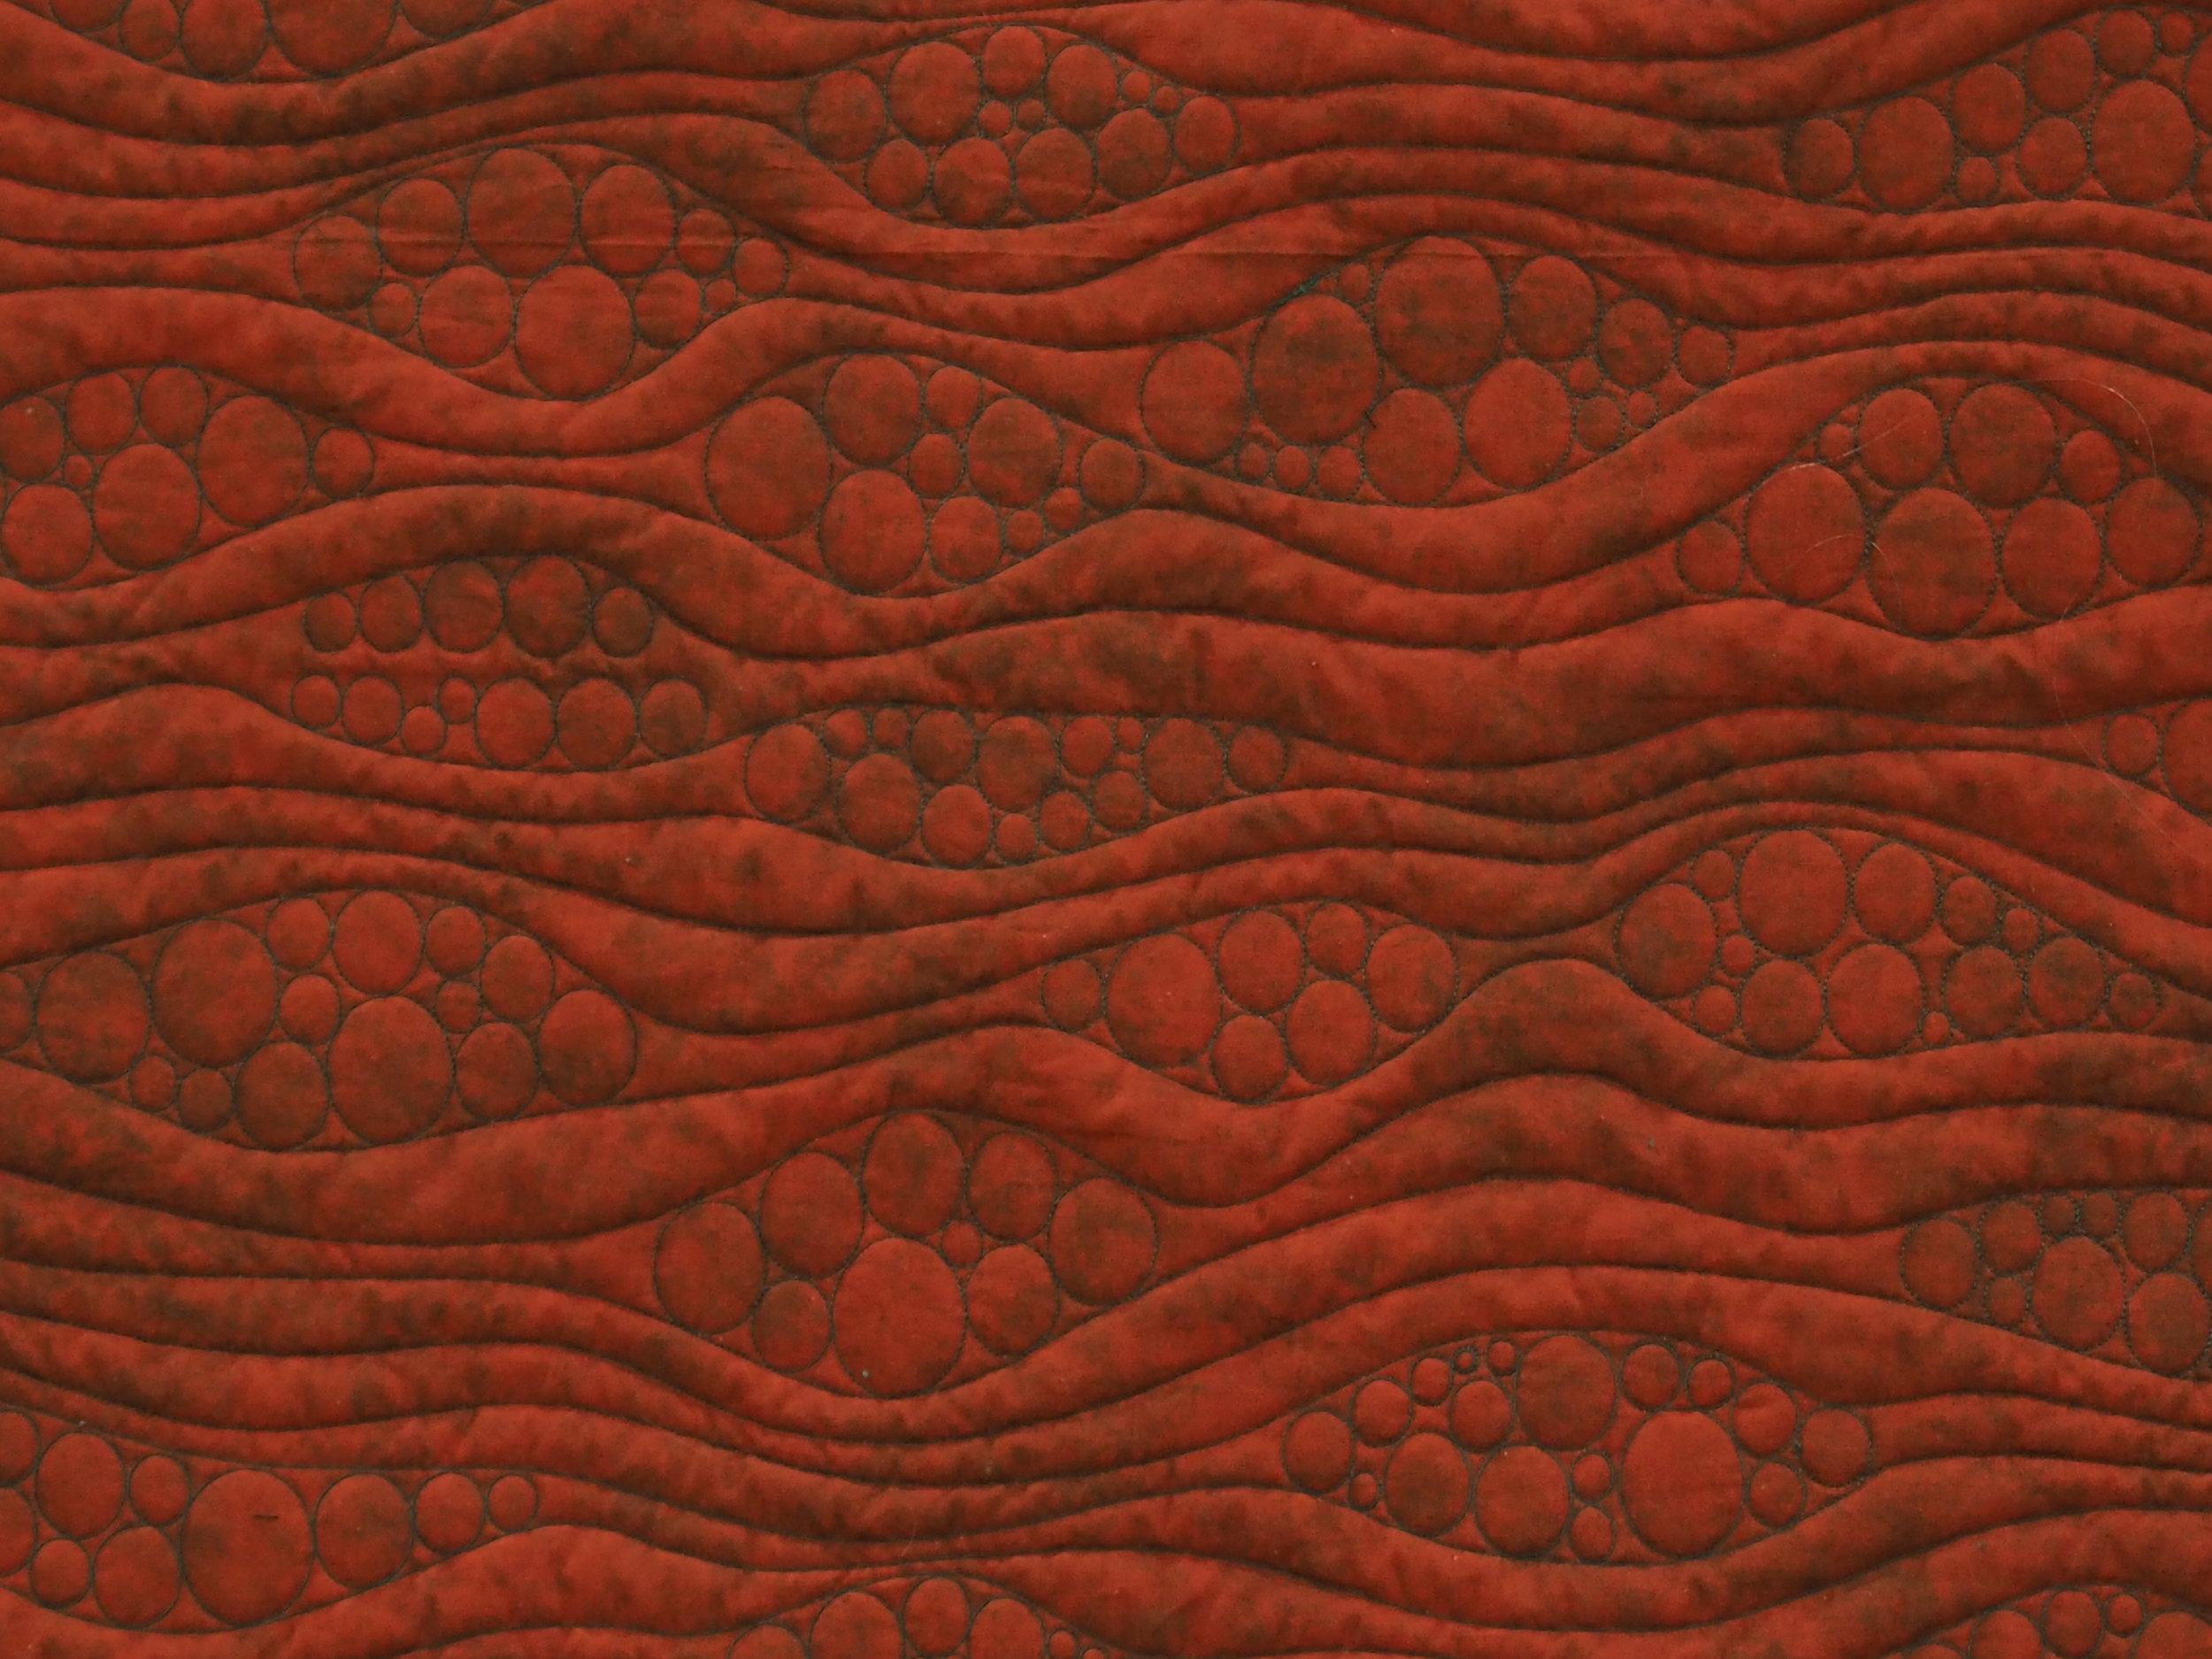 Quilting detail of On Ringo Lake by Elisa Corcoran